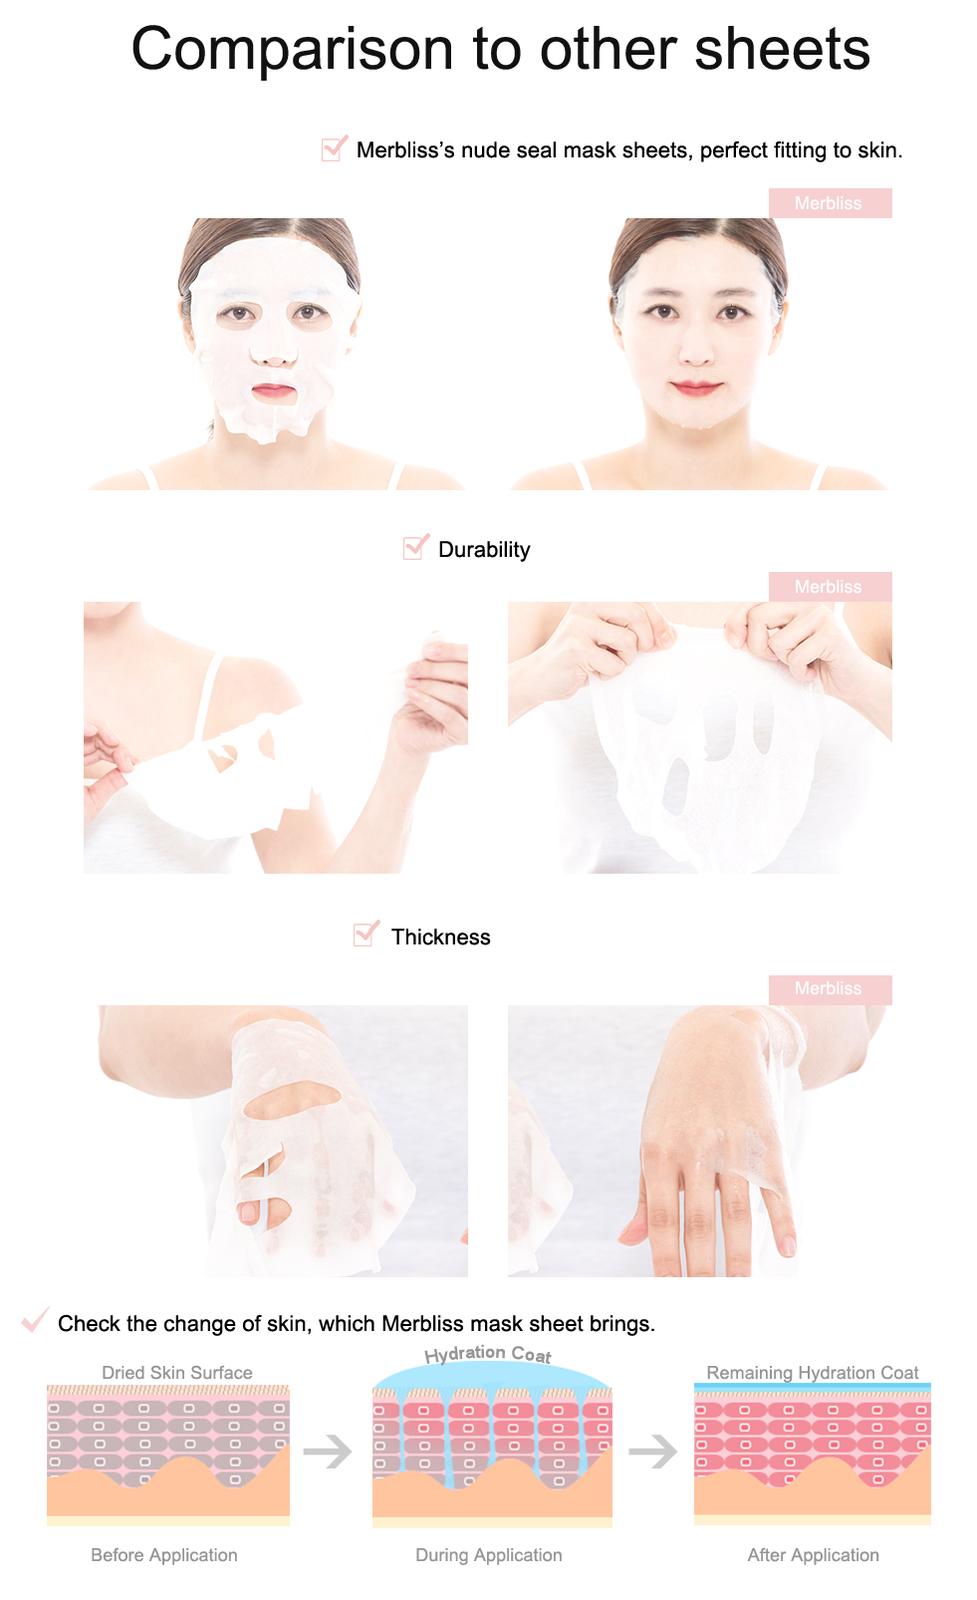 Wedding Dress Intense Hydration Coating Nude Seal Mask-7